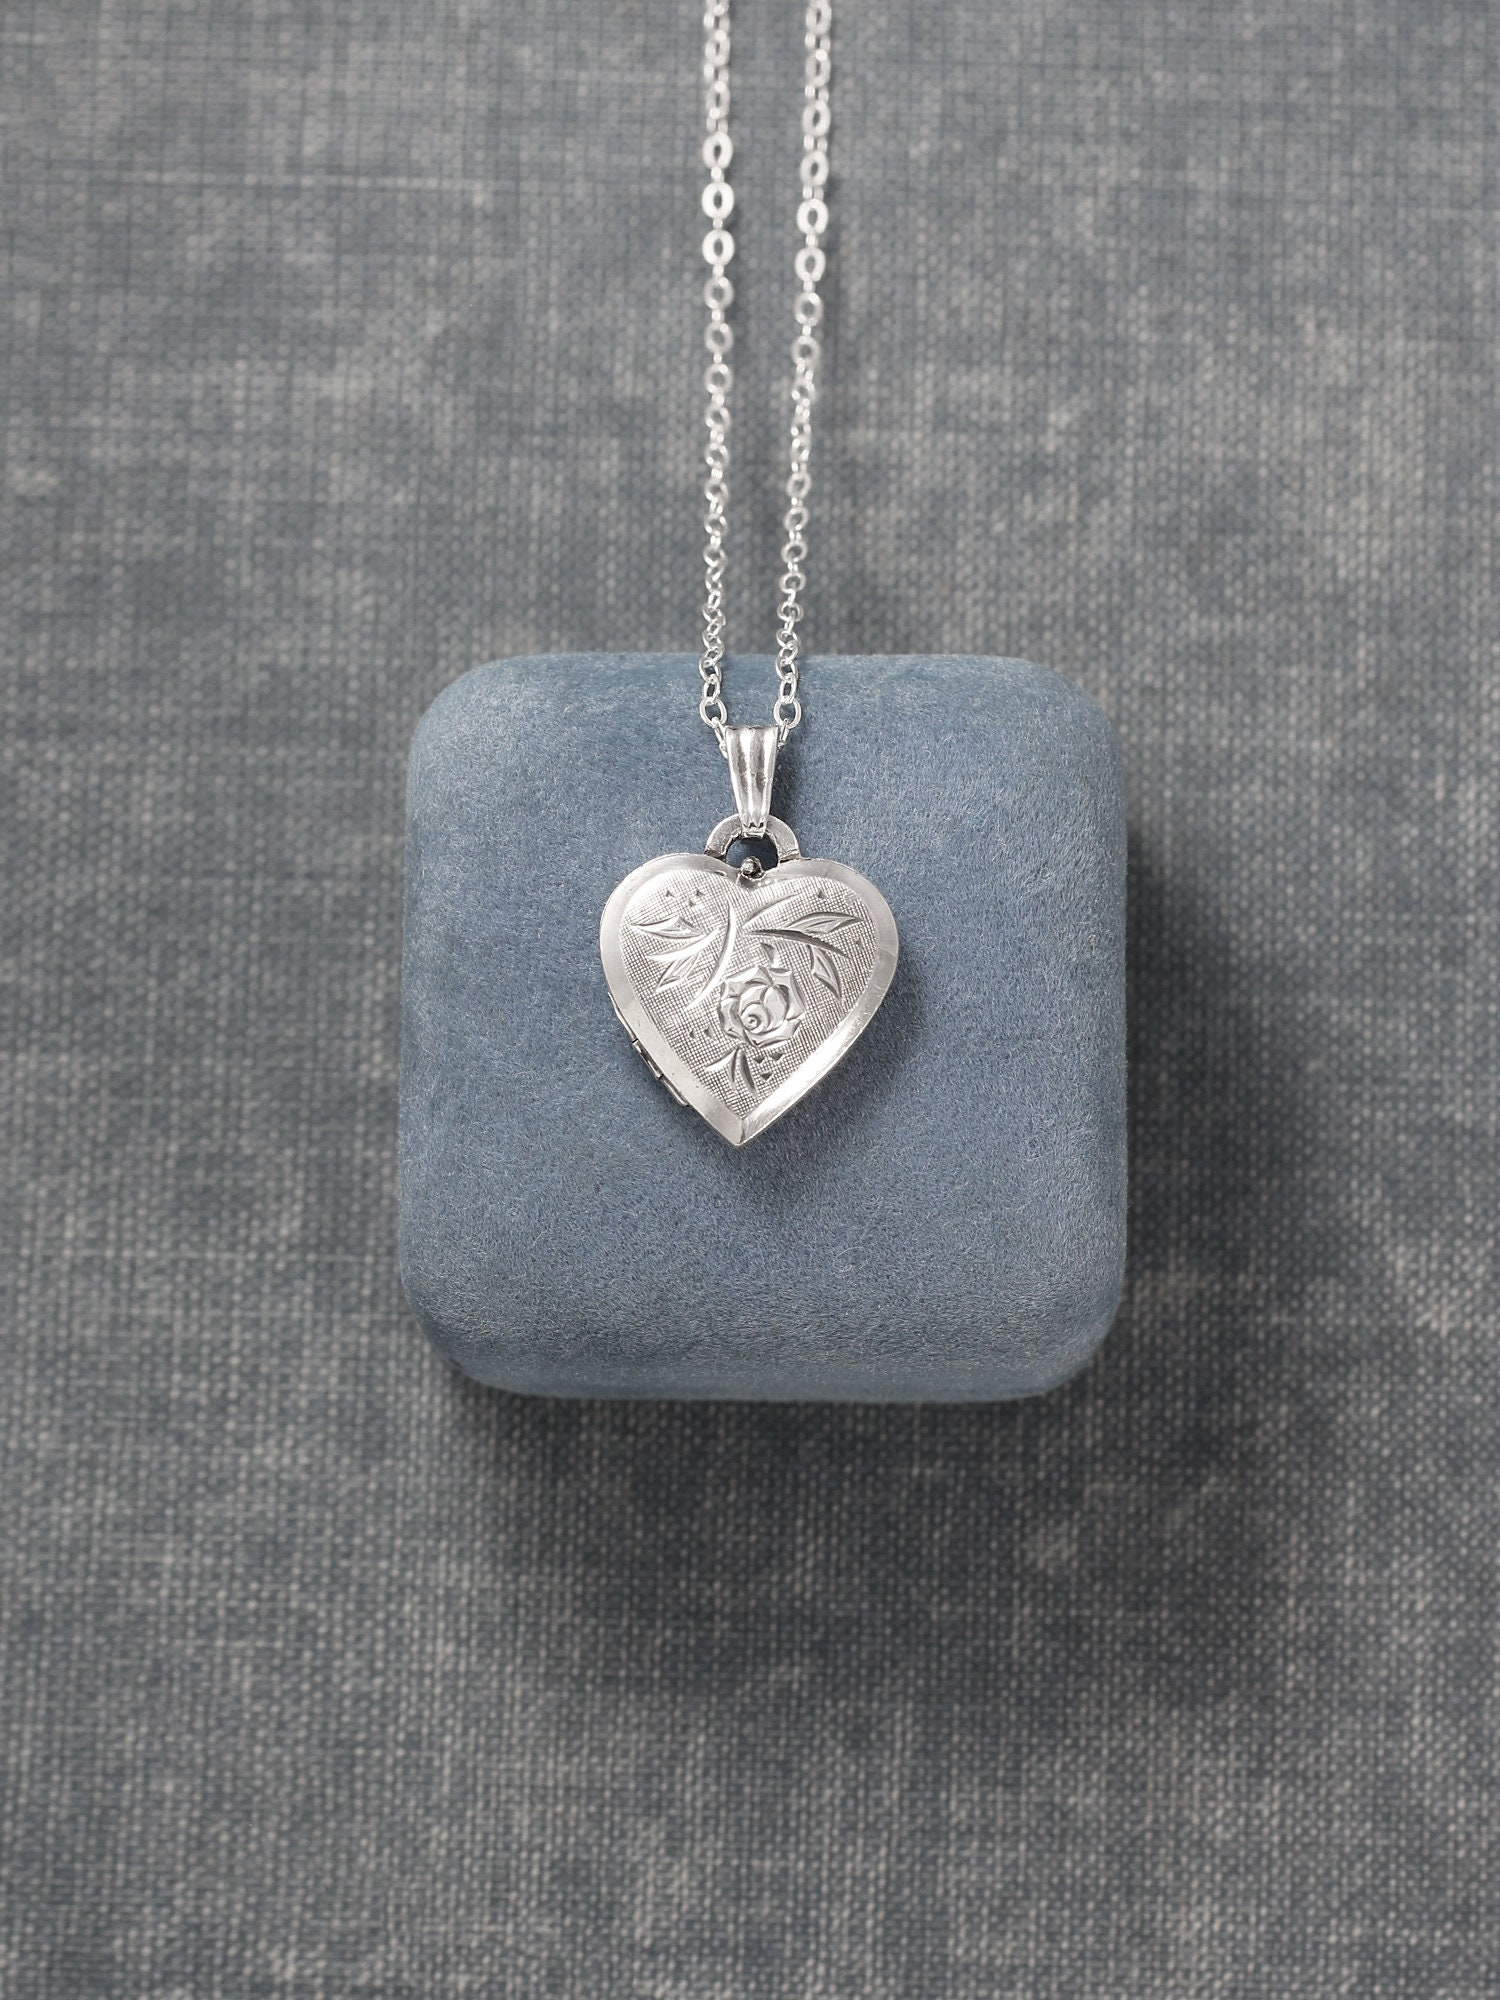 Vintage Sterling Silver Heart Locket Pendant